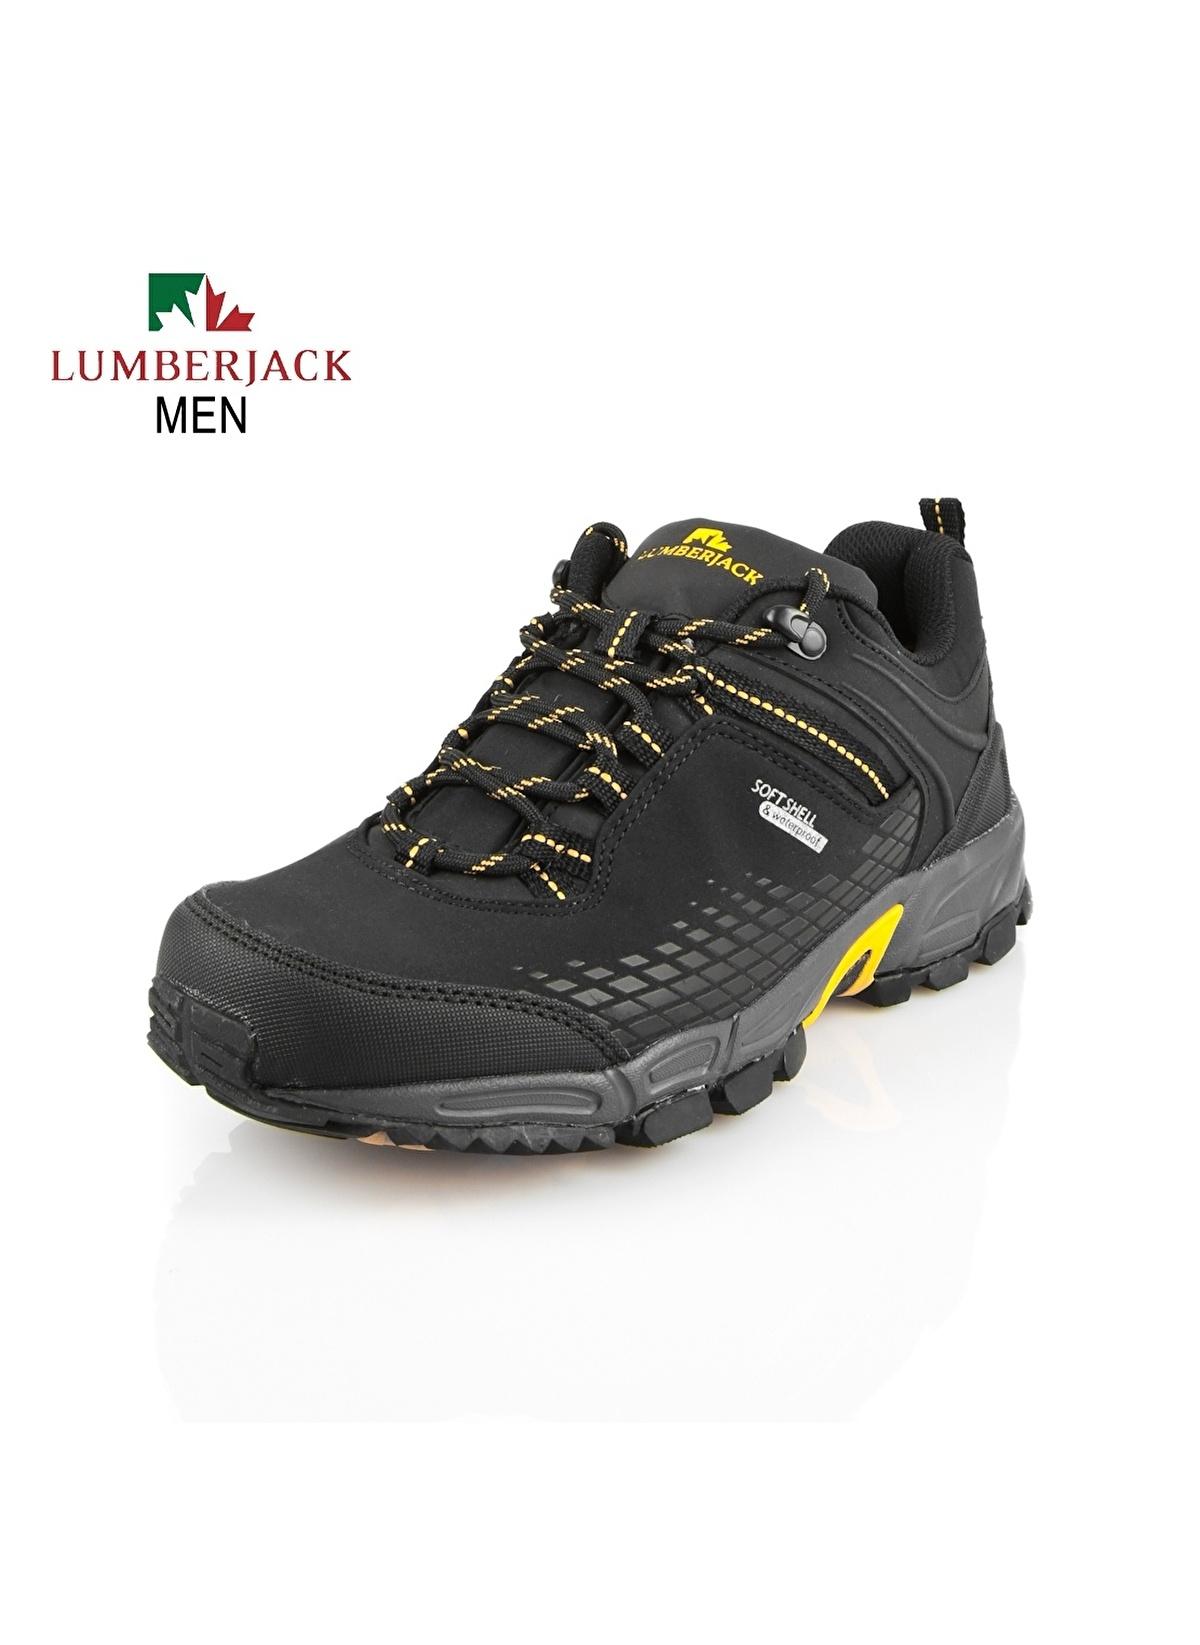 Lumberjack Outdoor Ayakkabı Flake Lumberjack Klasik Ayakkabı – 229.99 TL